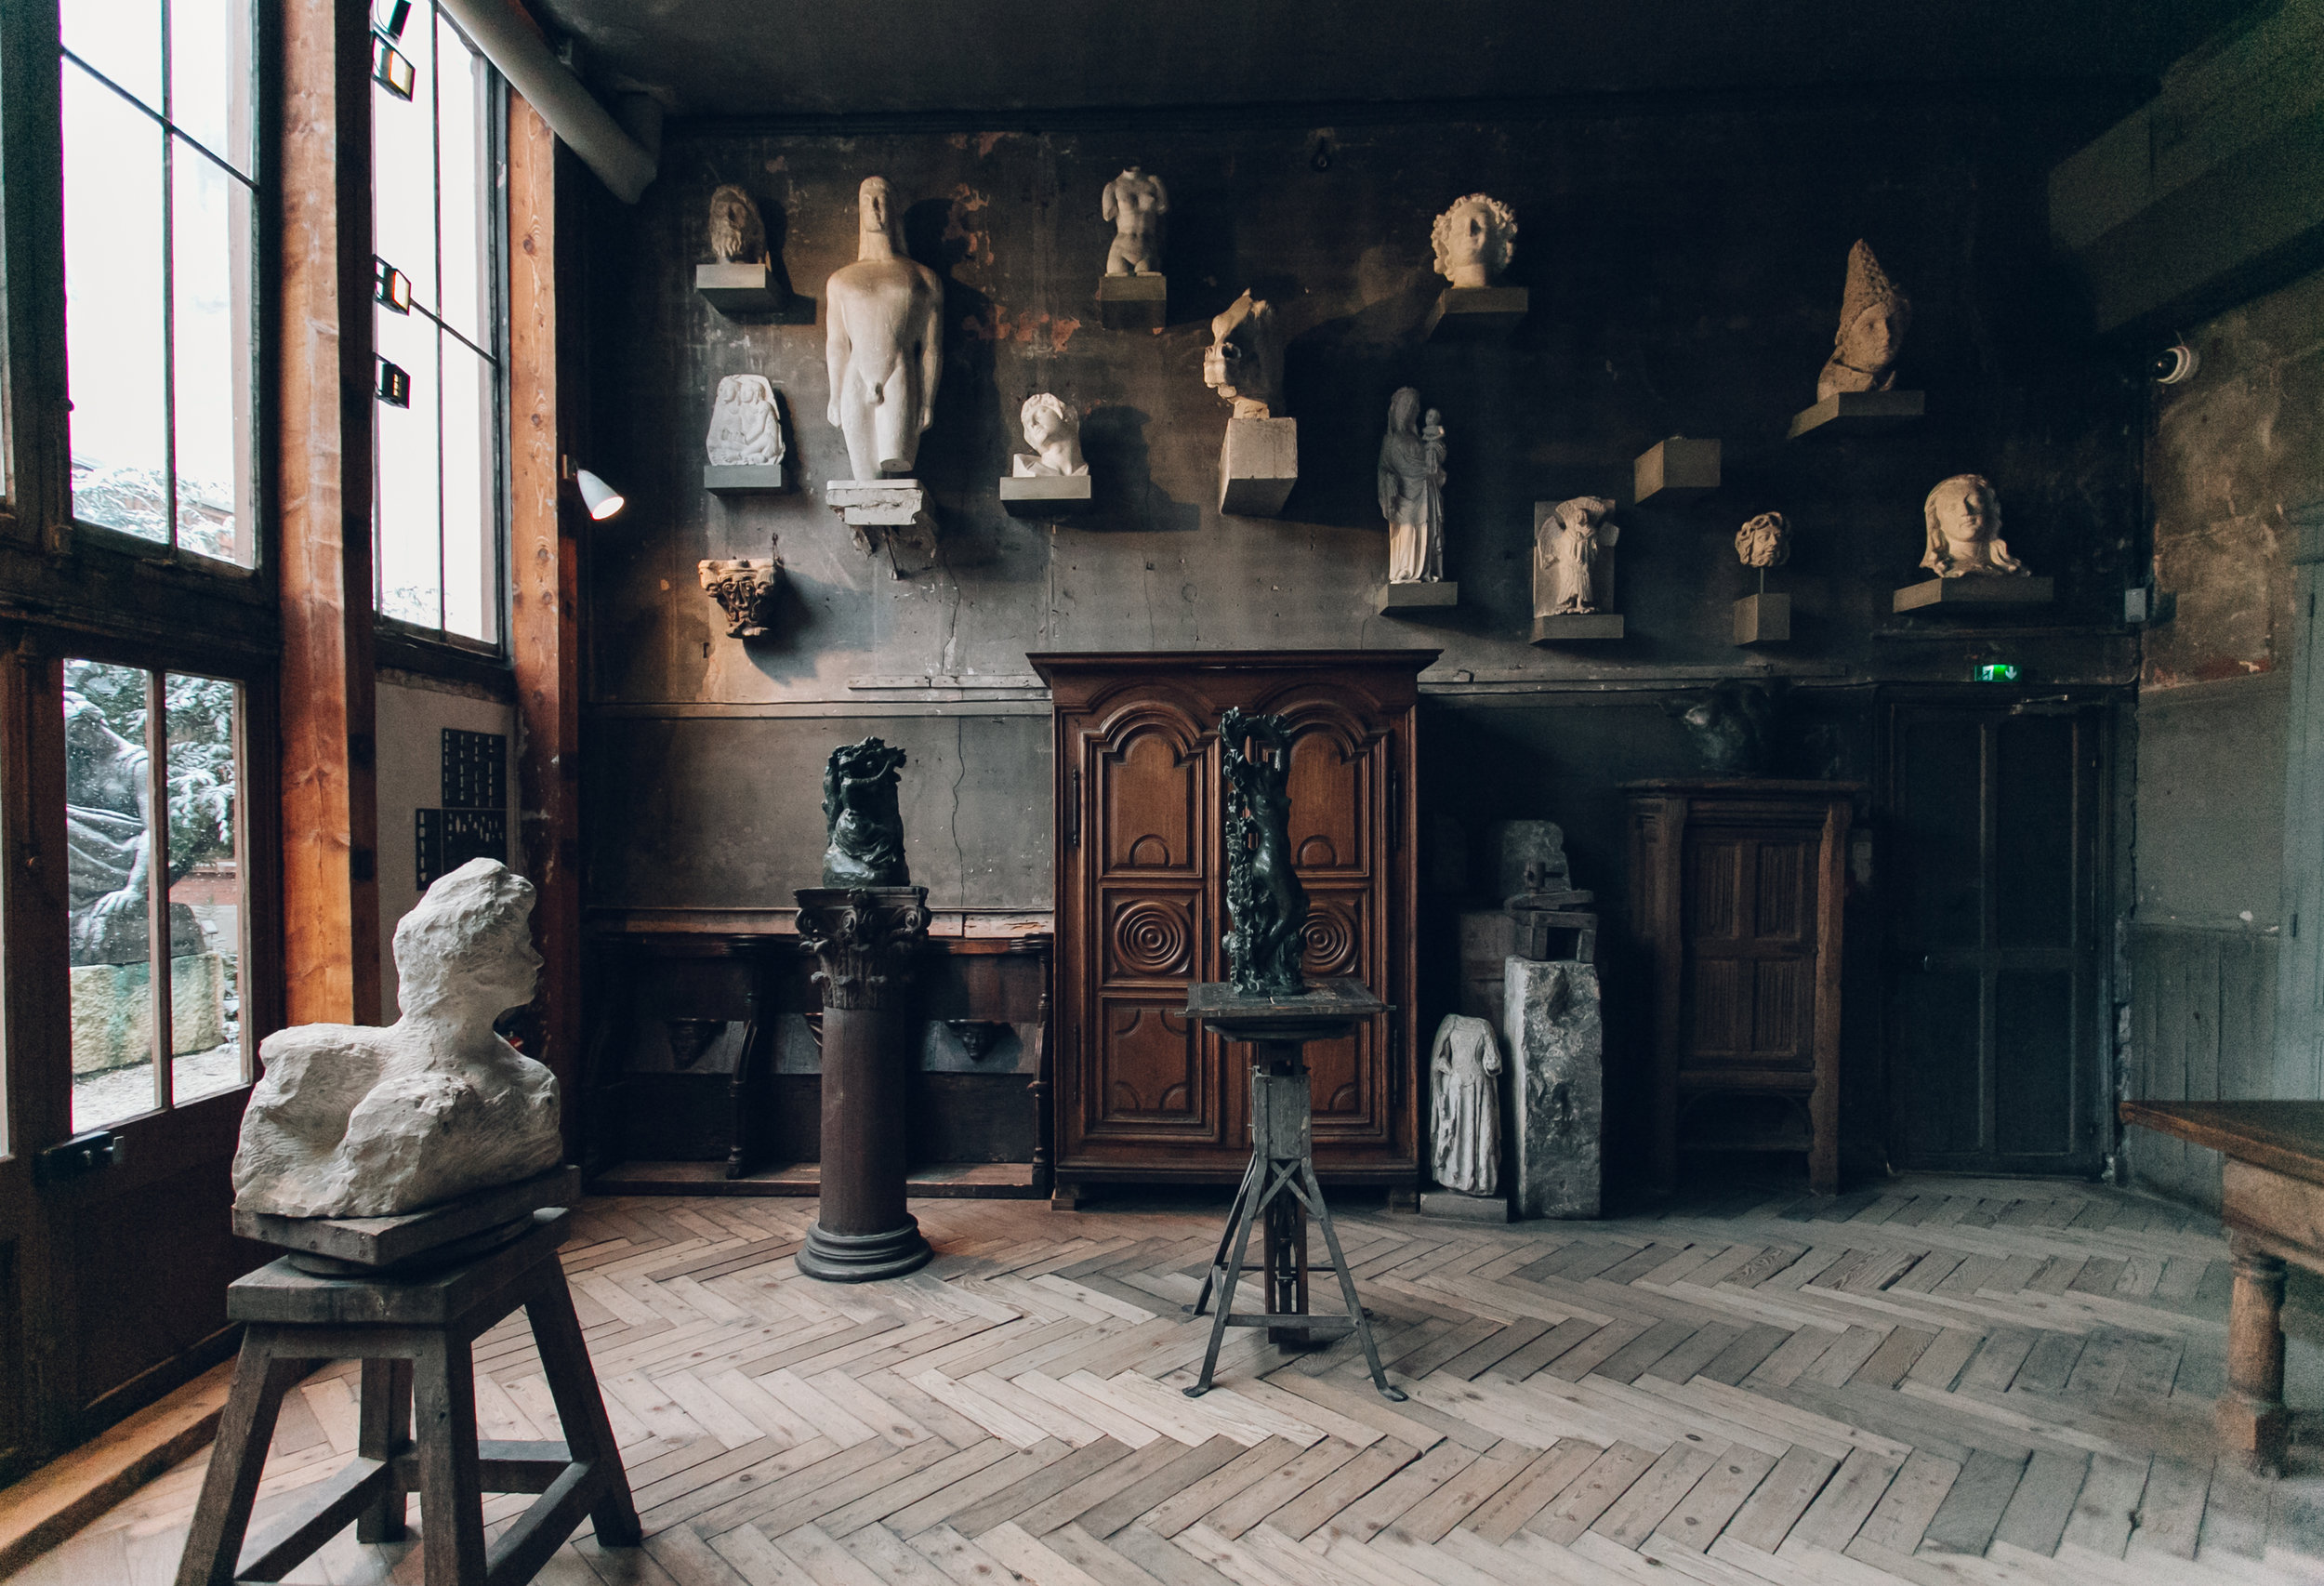 Musee Bourdelle in Paris - by Haarkon.